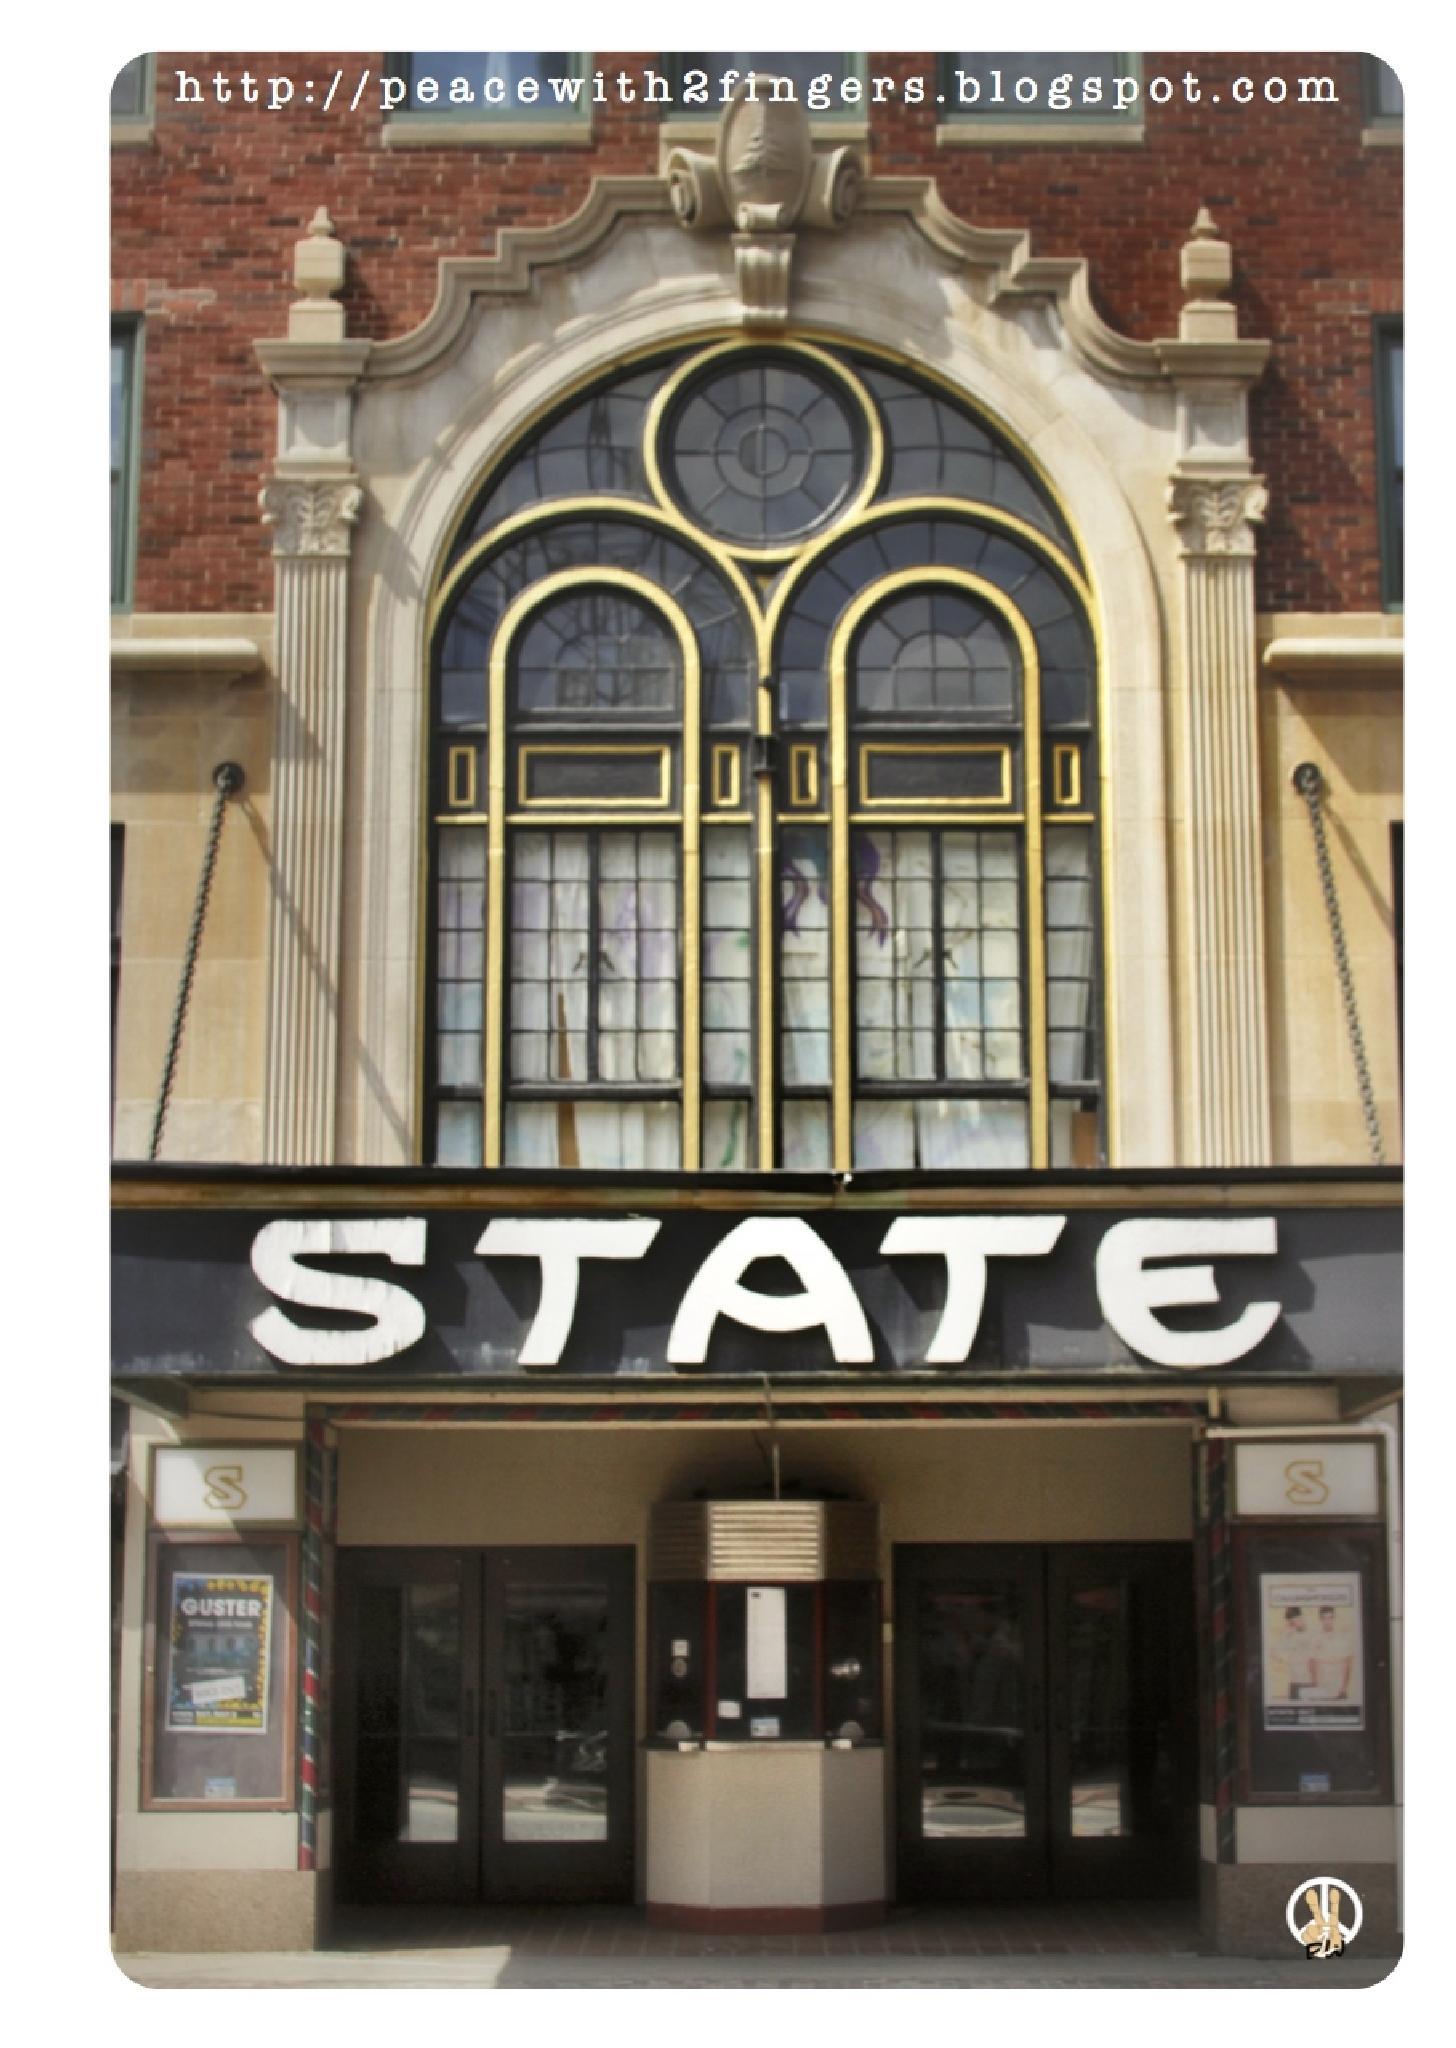 The State. by Darryl Weddington